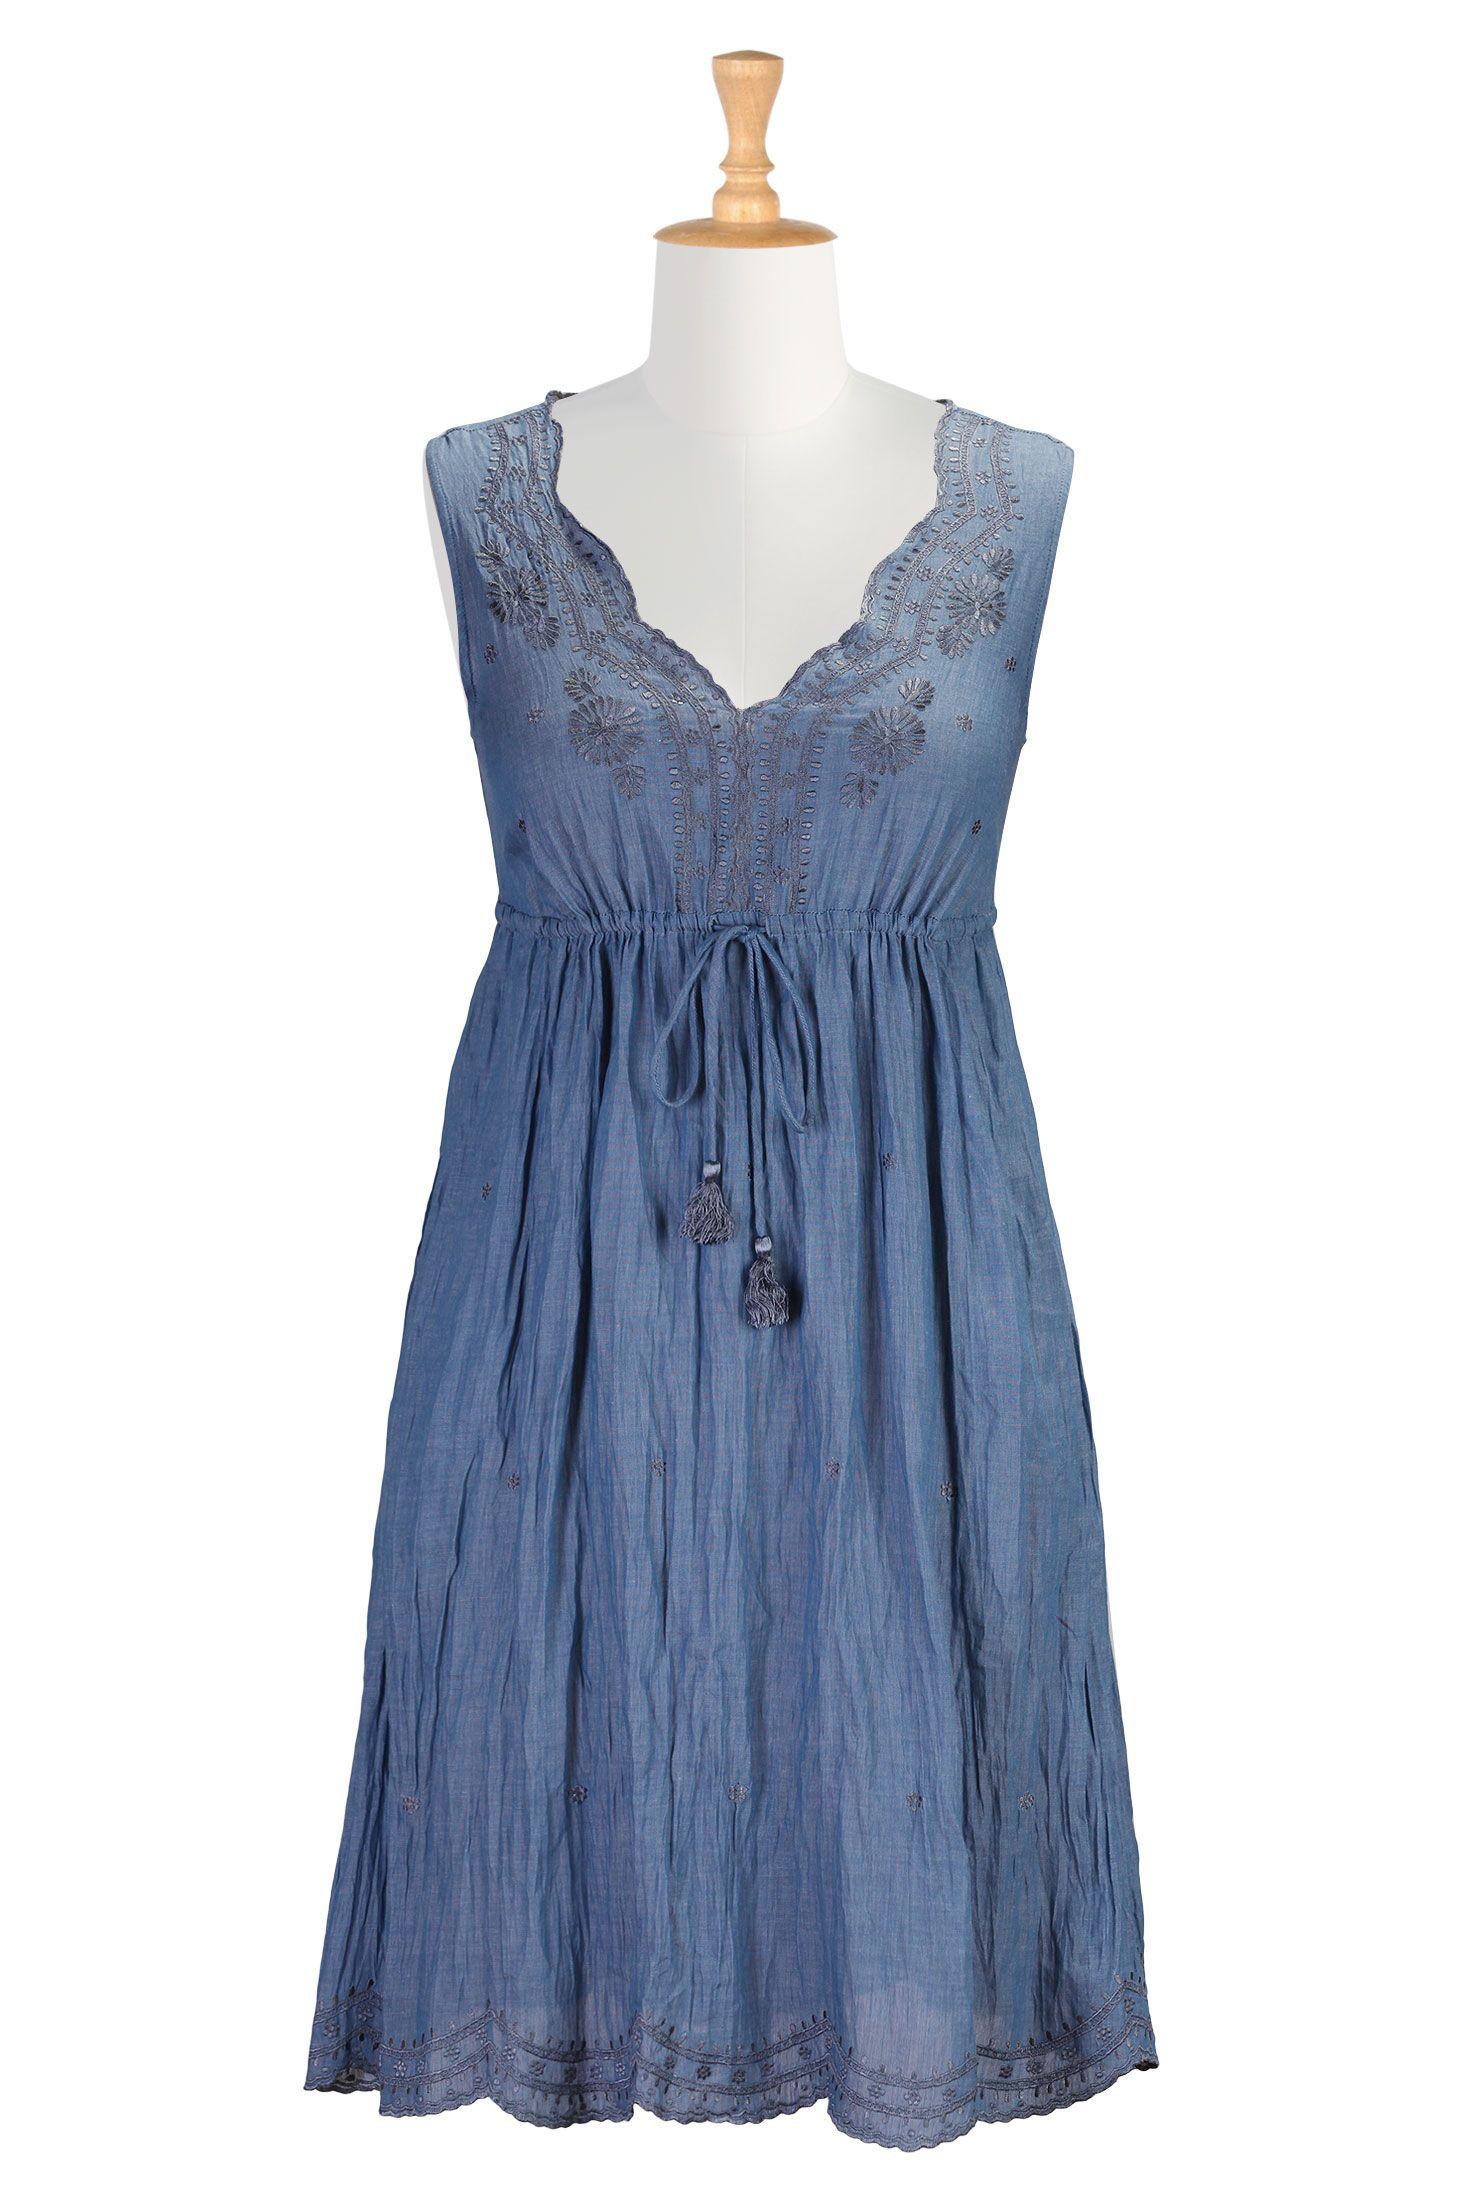 631a3f8f893 Indigo Chambray Voile Dresses